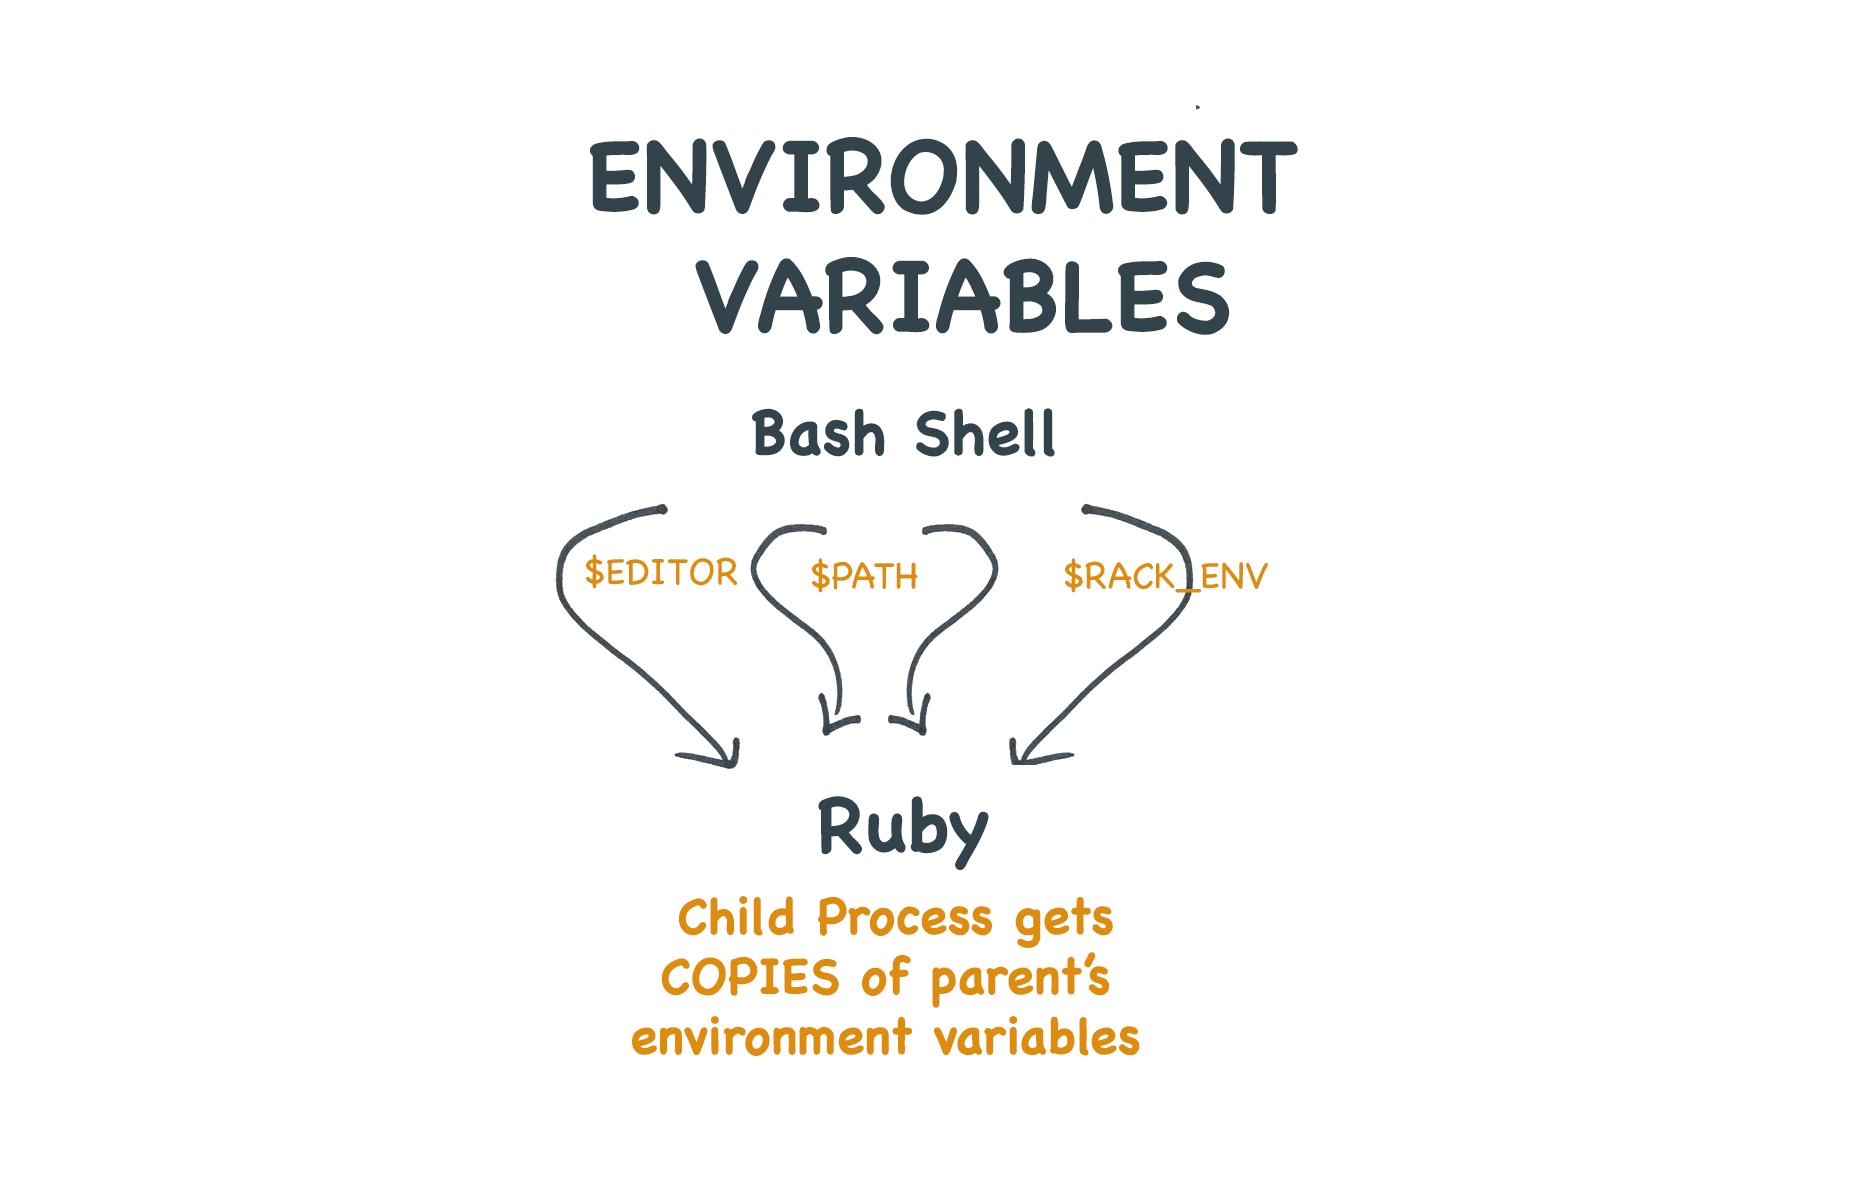 dos variable environnement